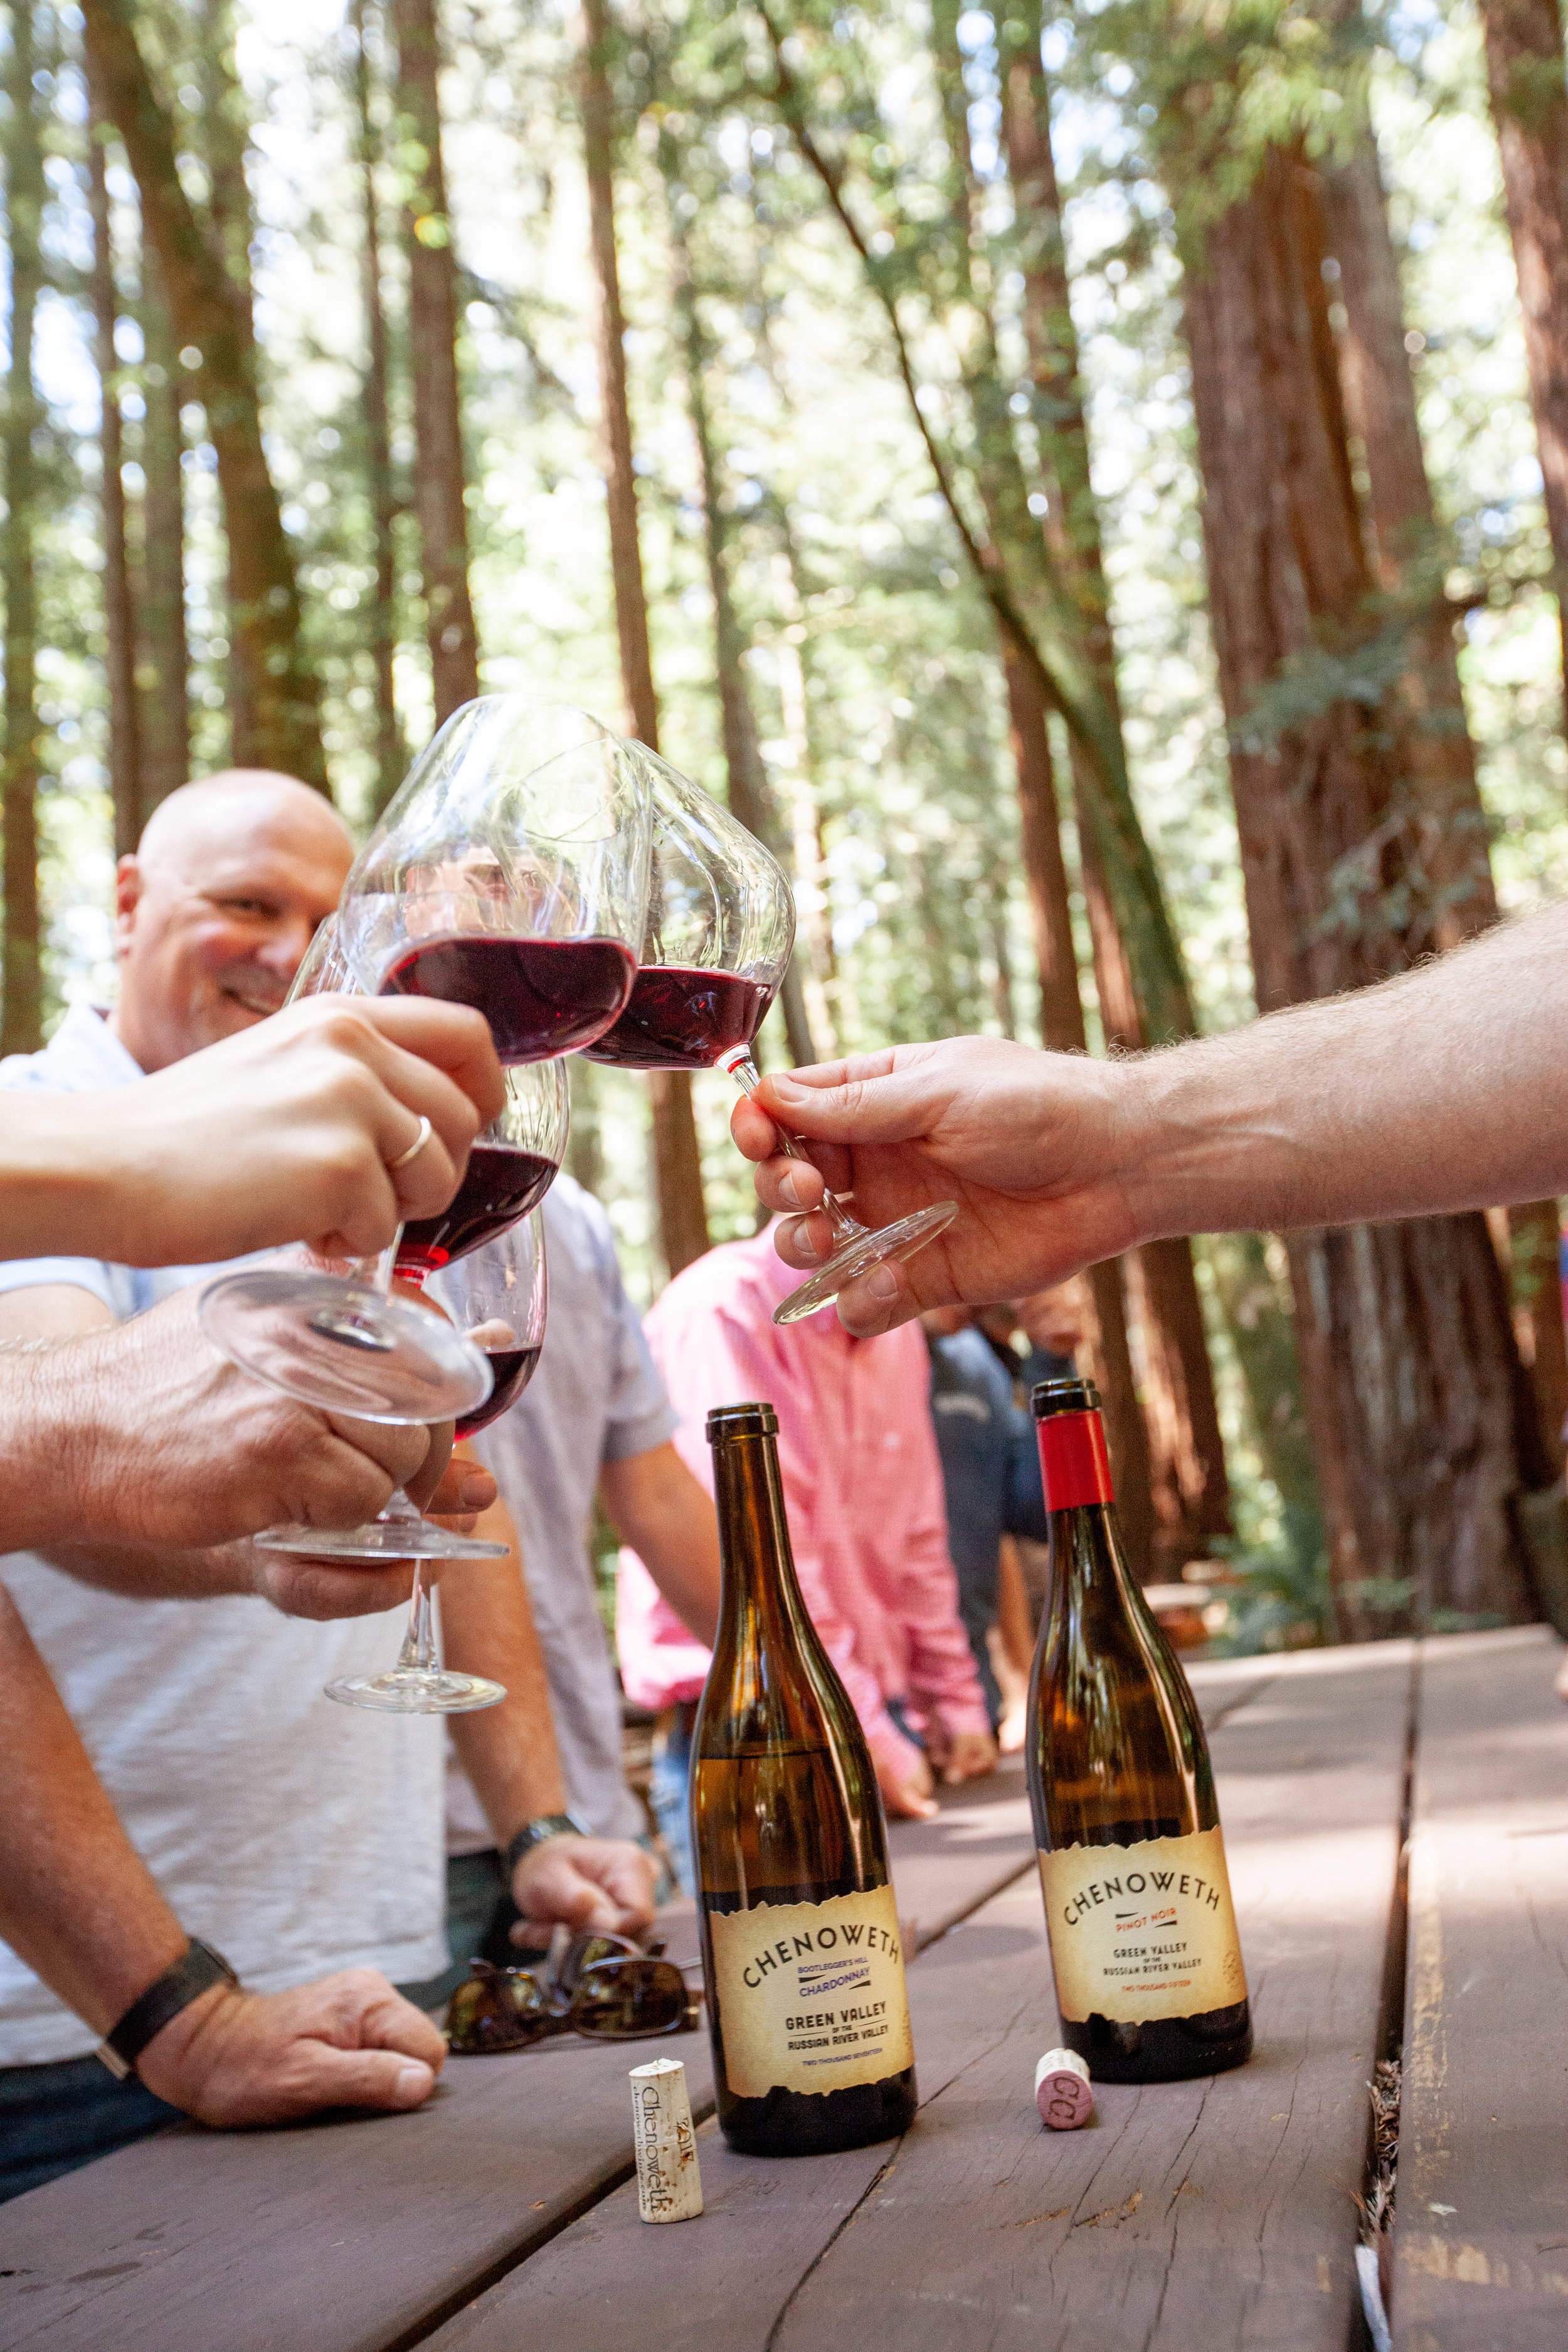 Chenoweth tasting in Redwood Grove